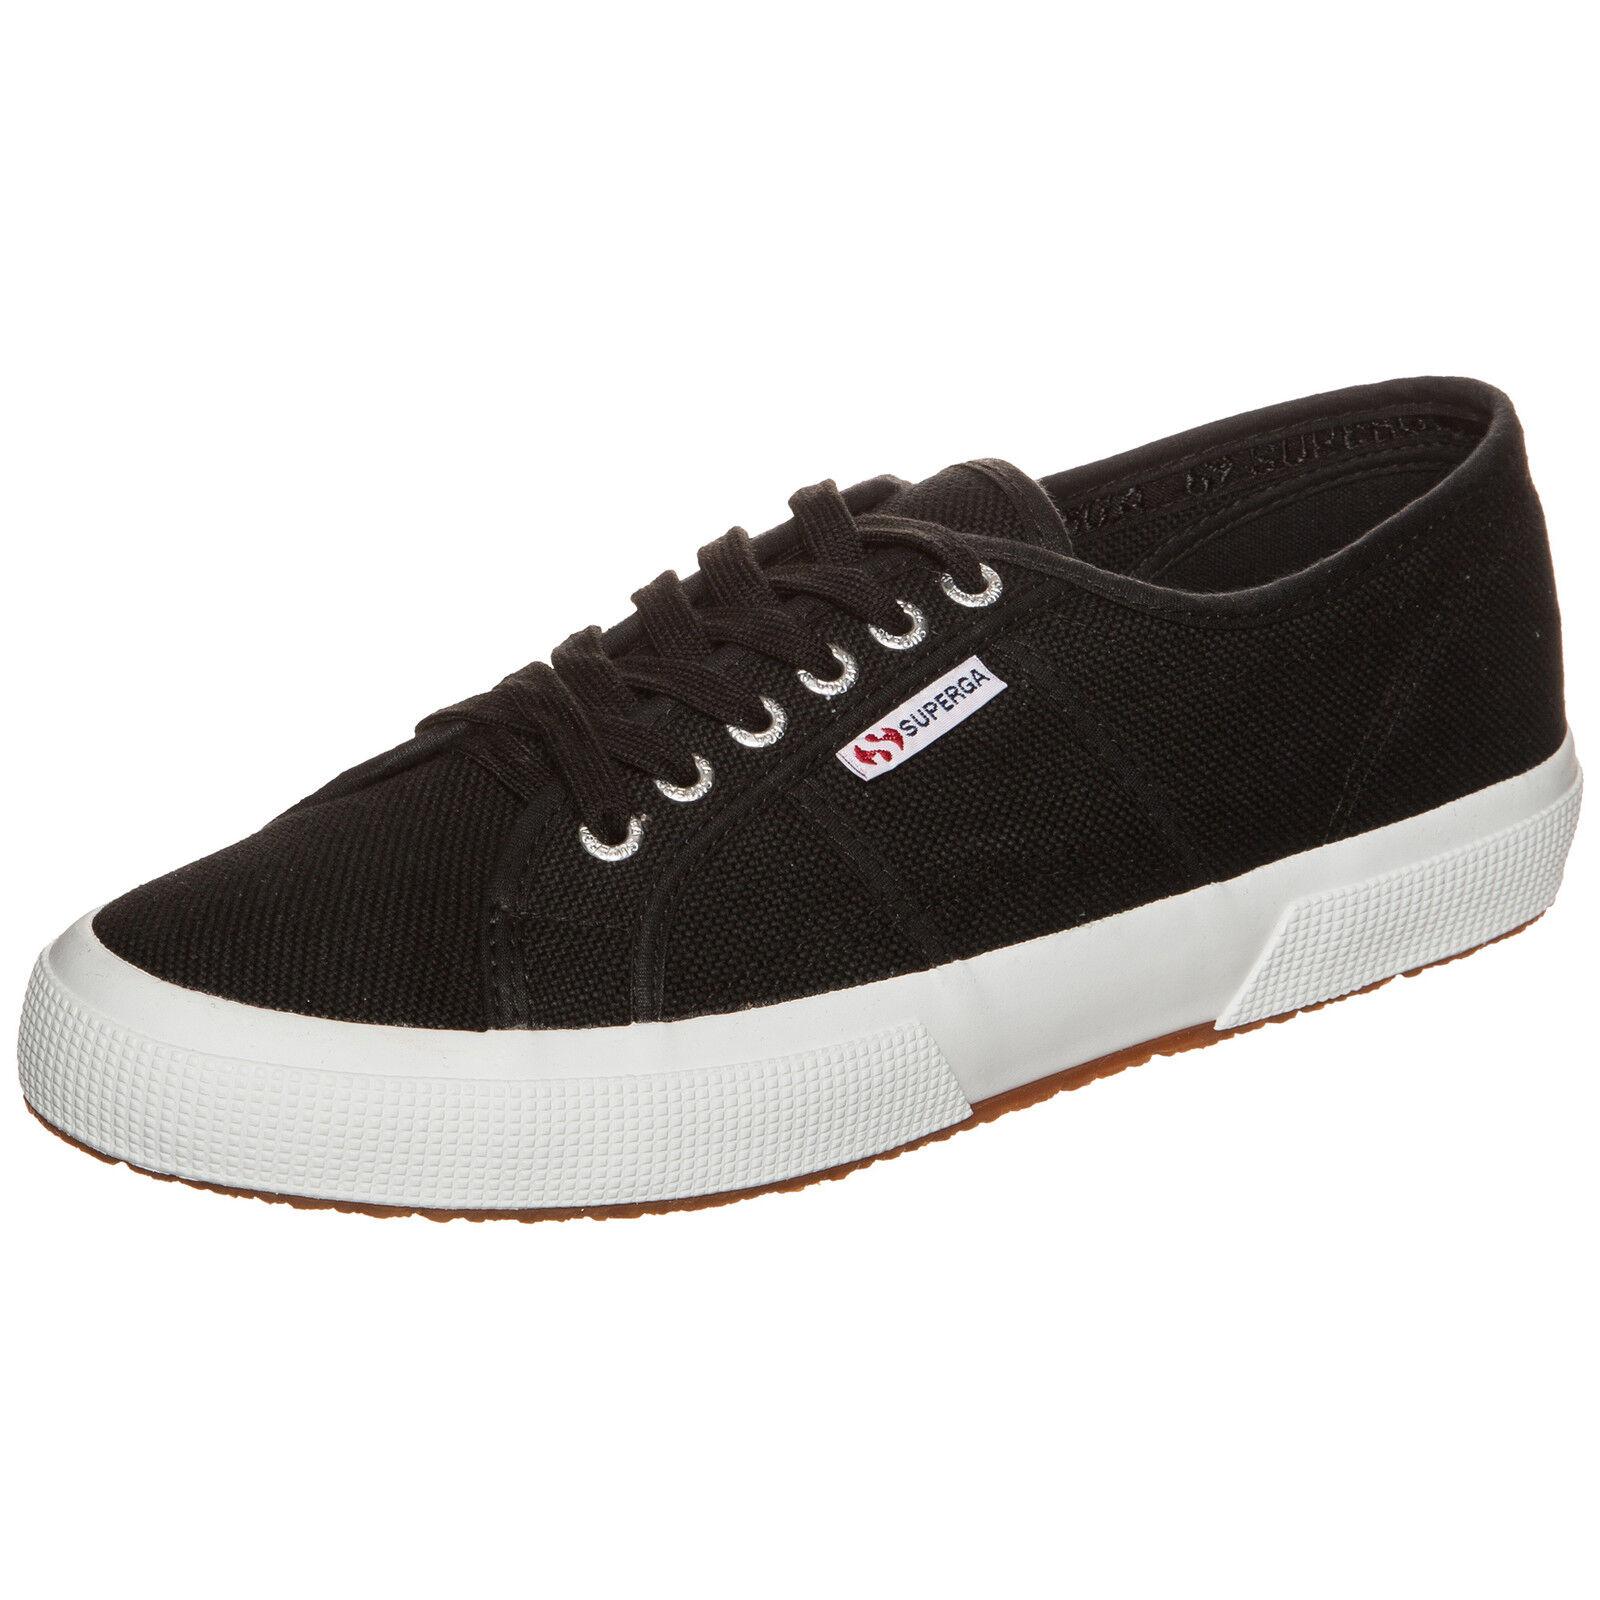 Superga 2750 Cotu Classic Sneaker Schwarz NEU Schuhe Turnschuhe